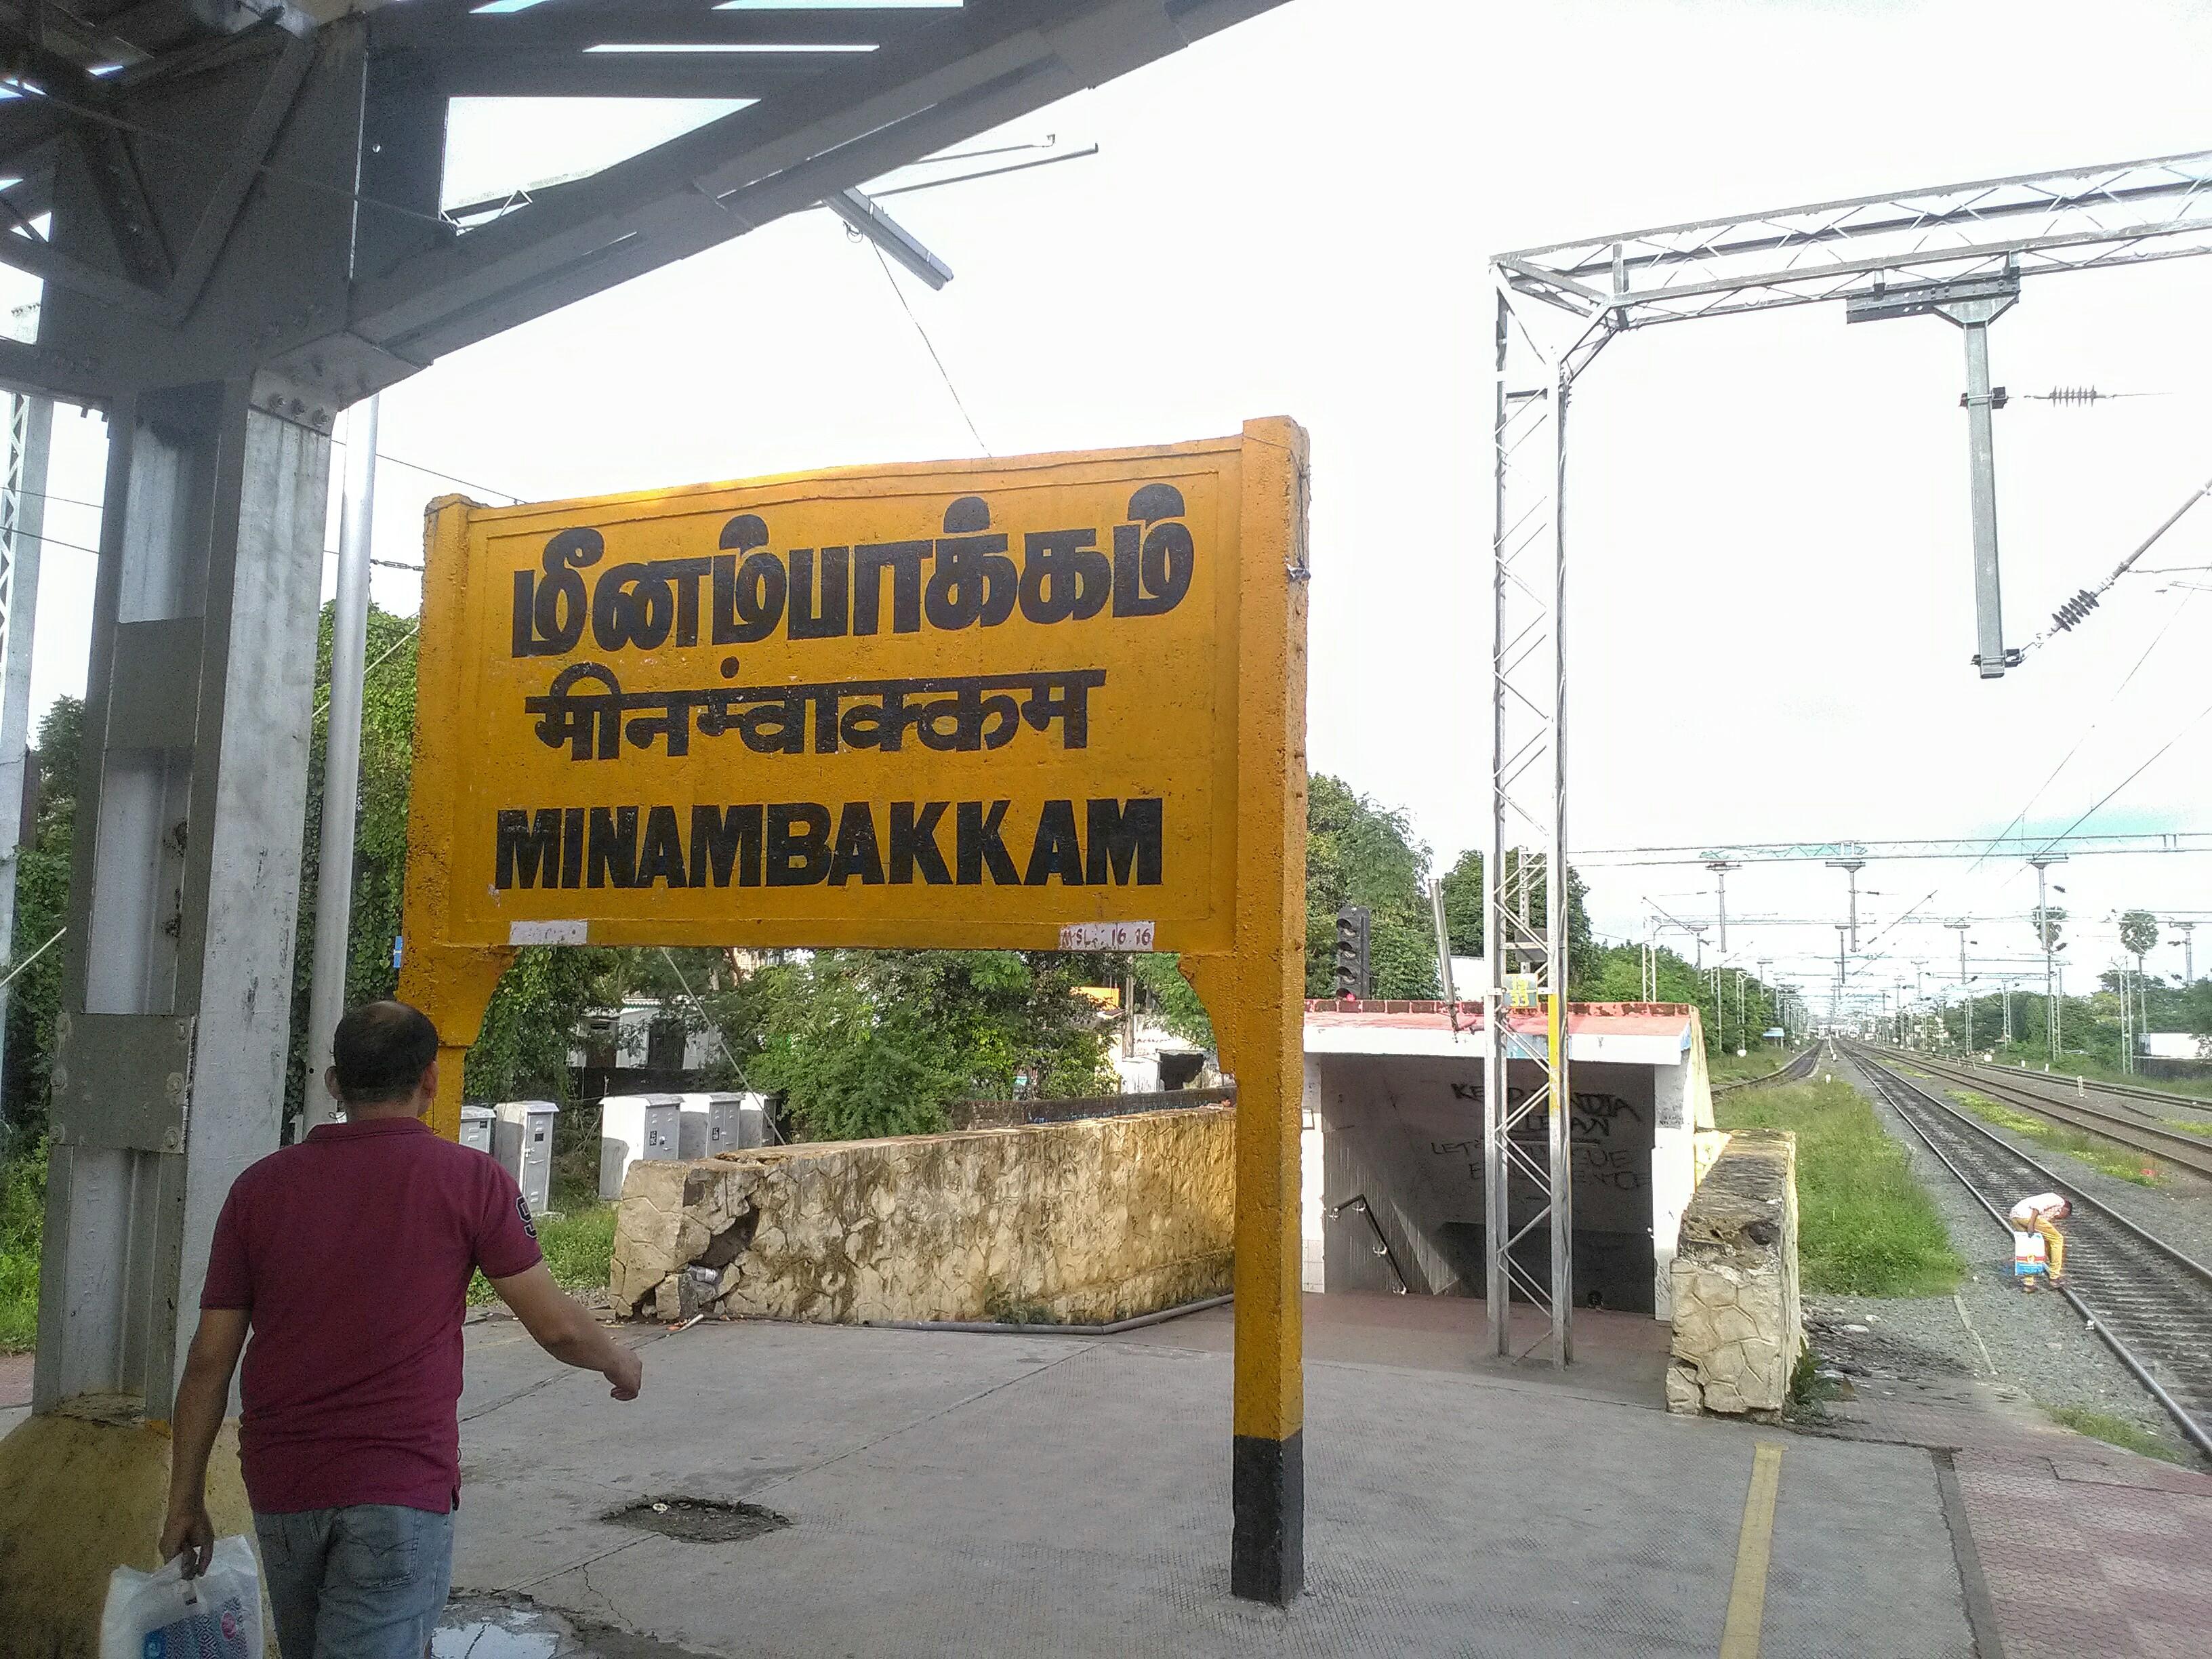 Meenambakkam railway station - Wikipedia